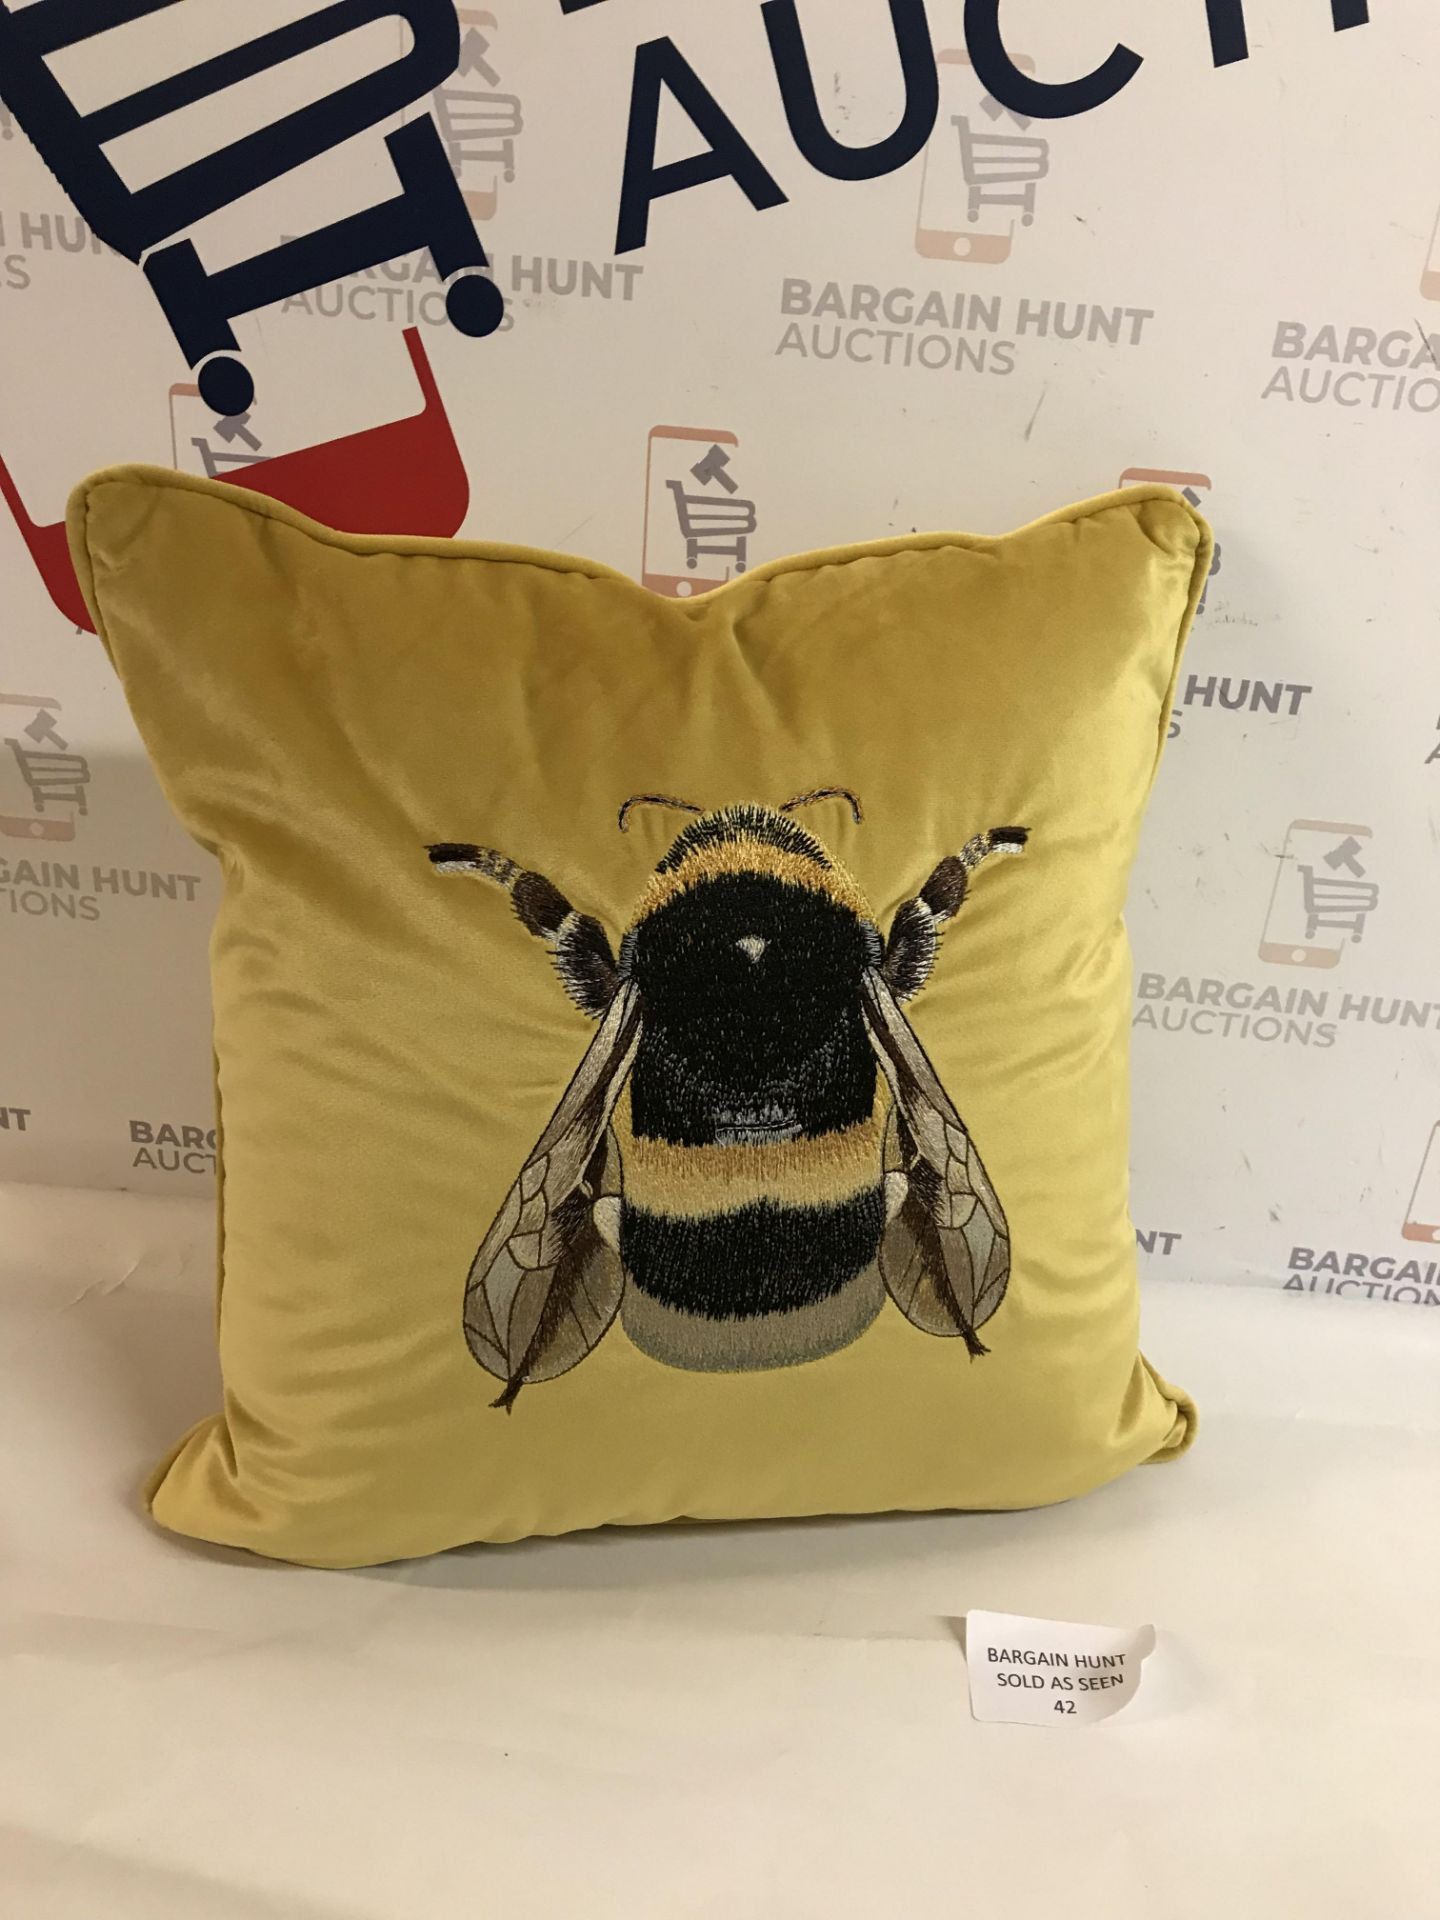 Lot 42 - Velvet Embroidered Bee Cushion